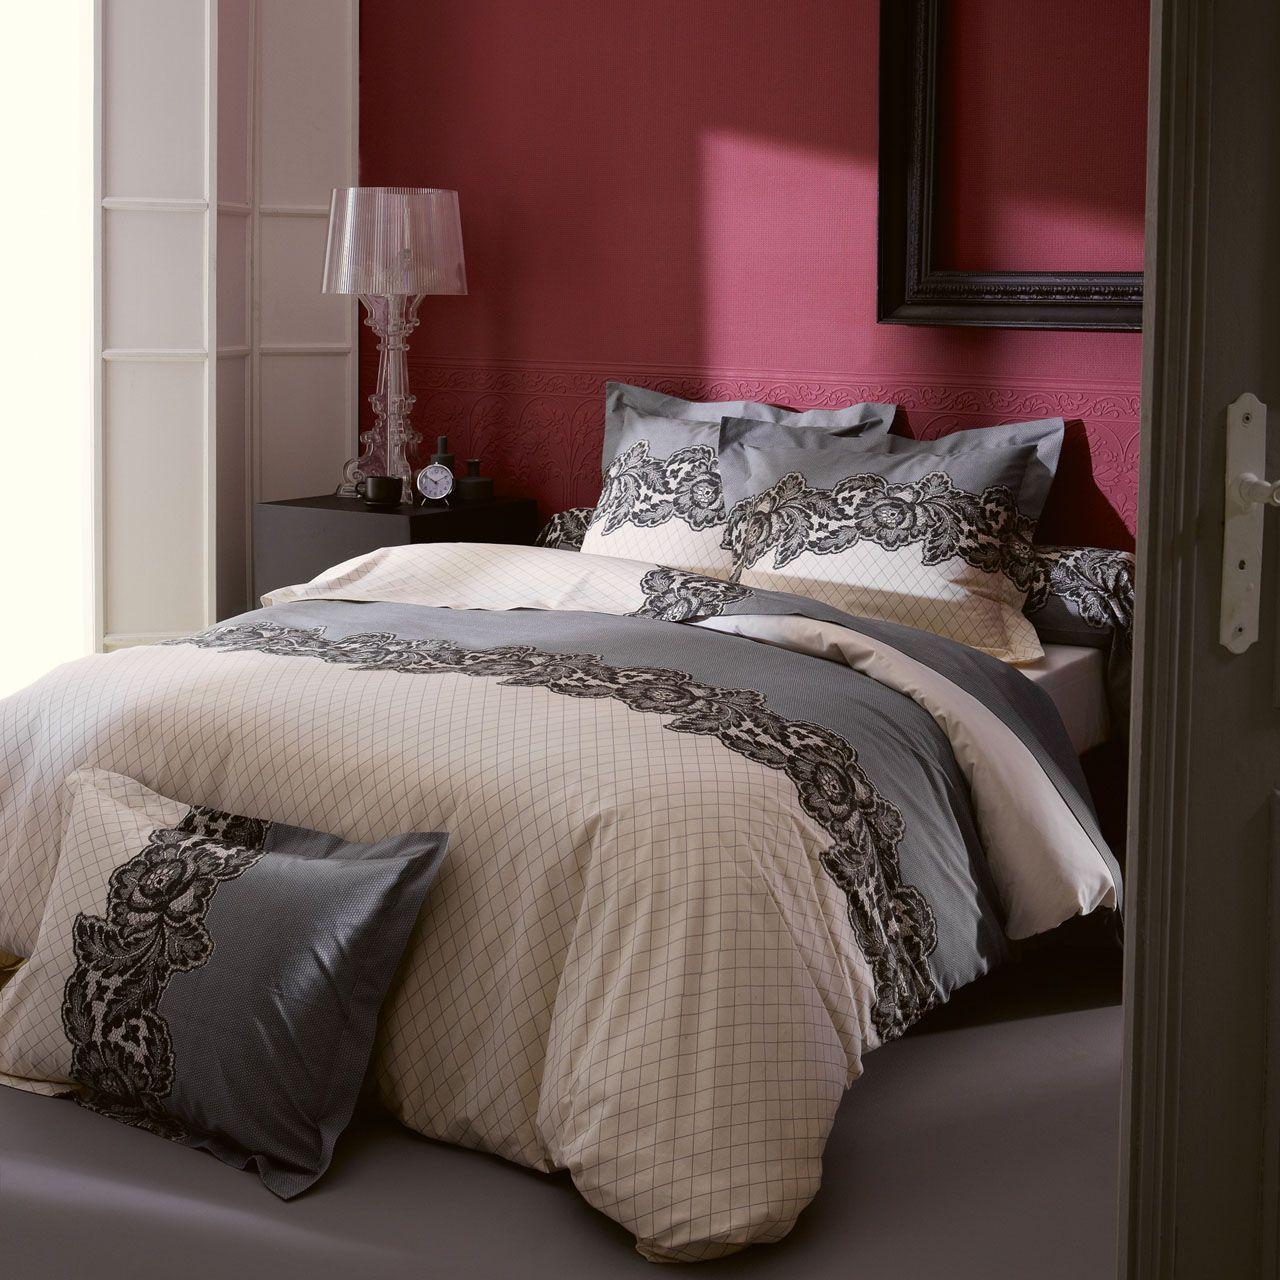 housse de couette malice 260x240 tradilinge. Black Bedroom Furniture Sets. Home Design Ideas